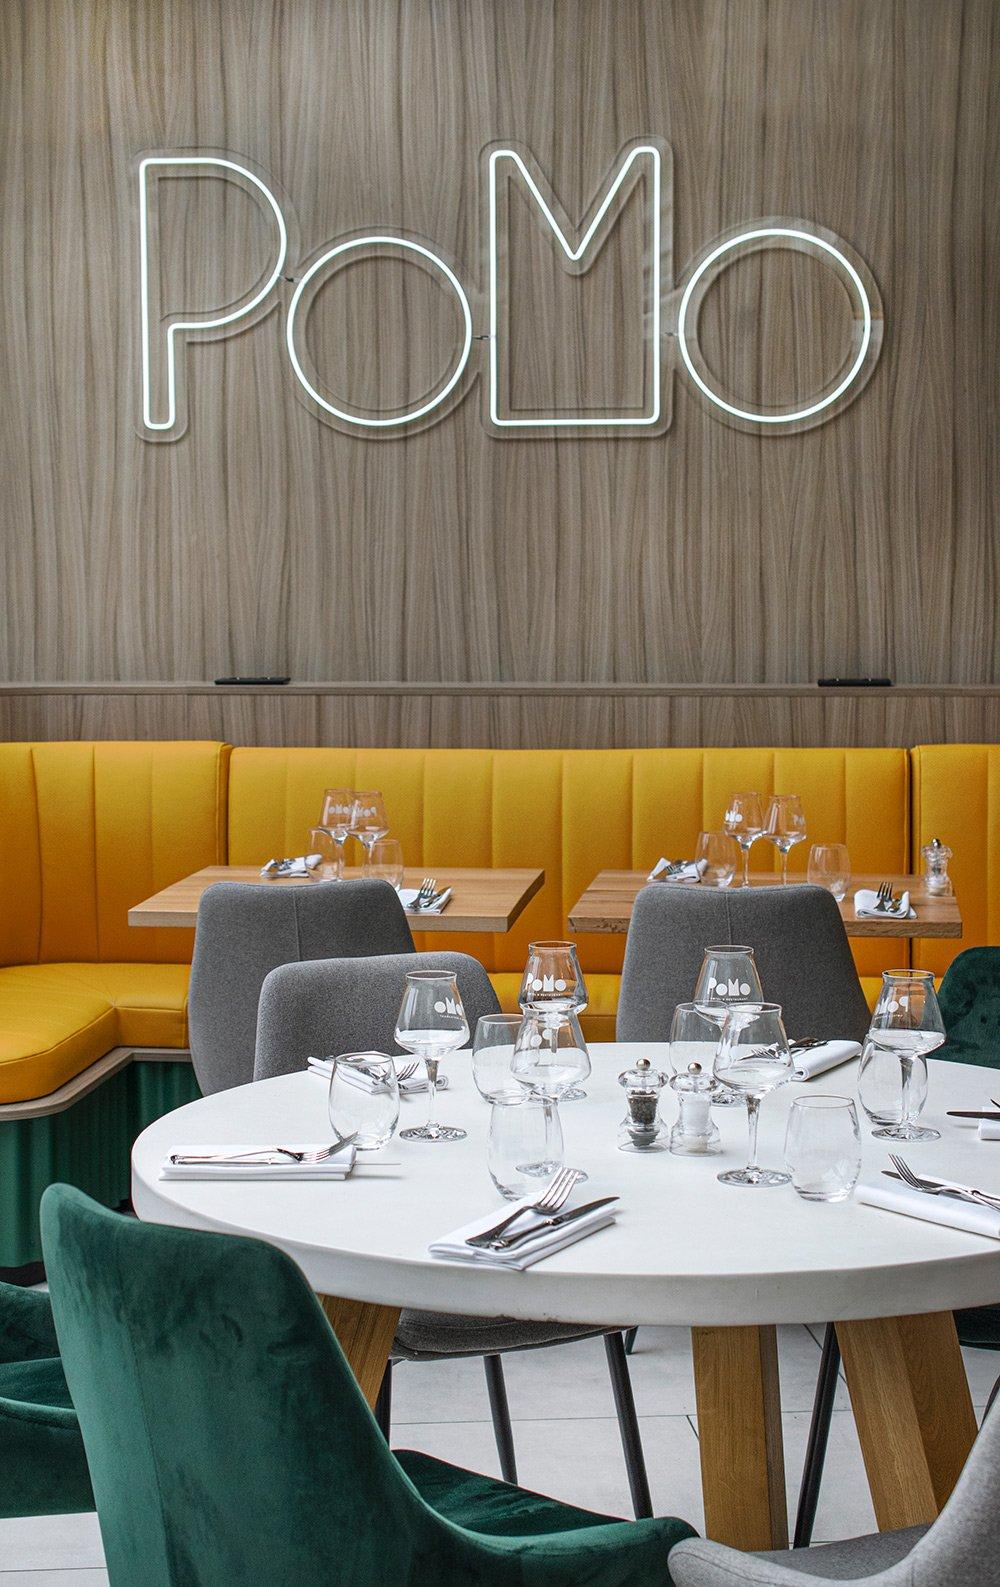 pomo-hotel-restaurant-echirolles